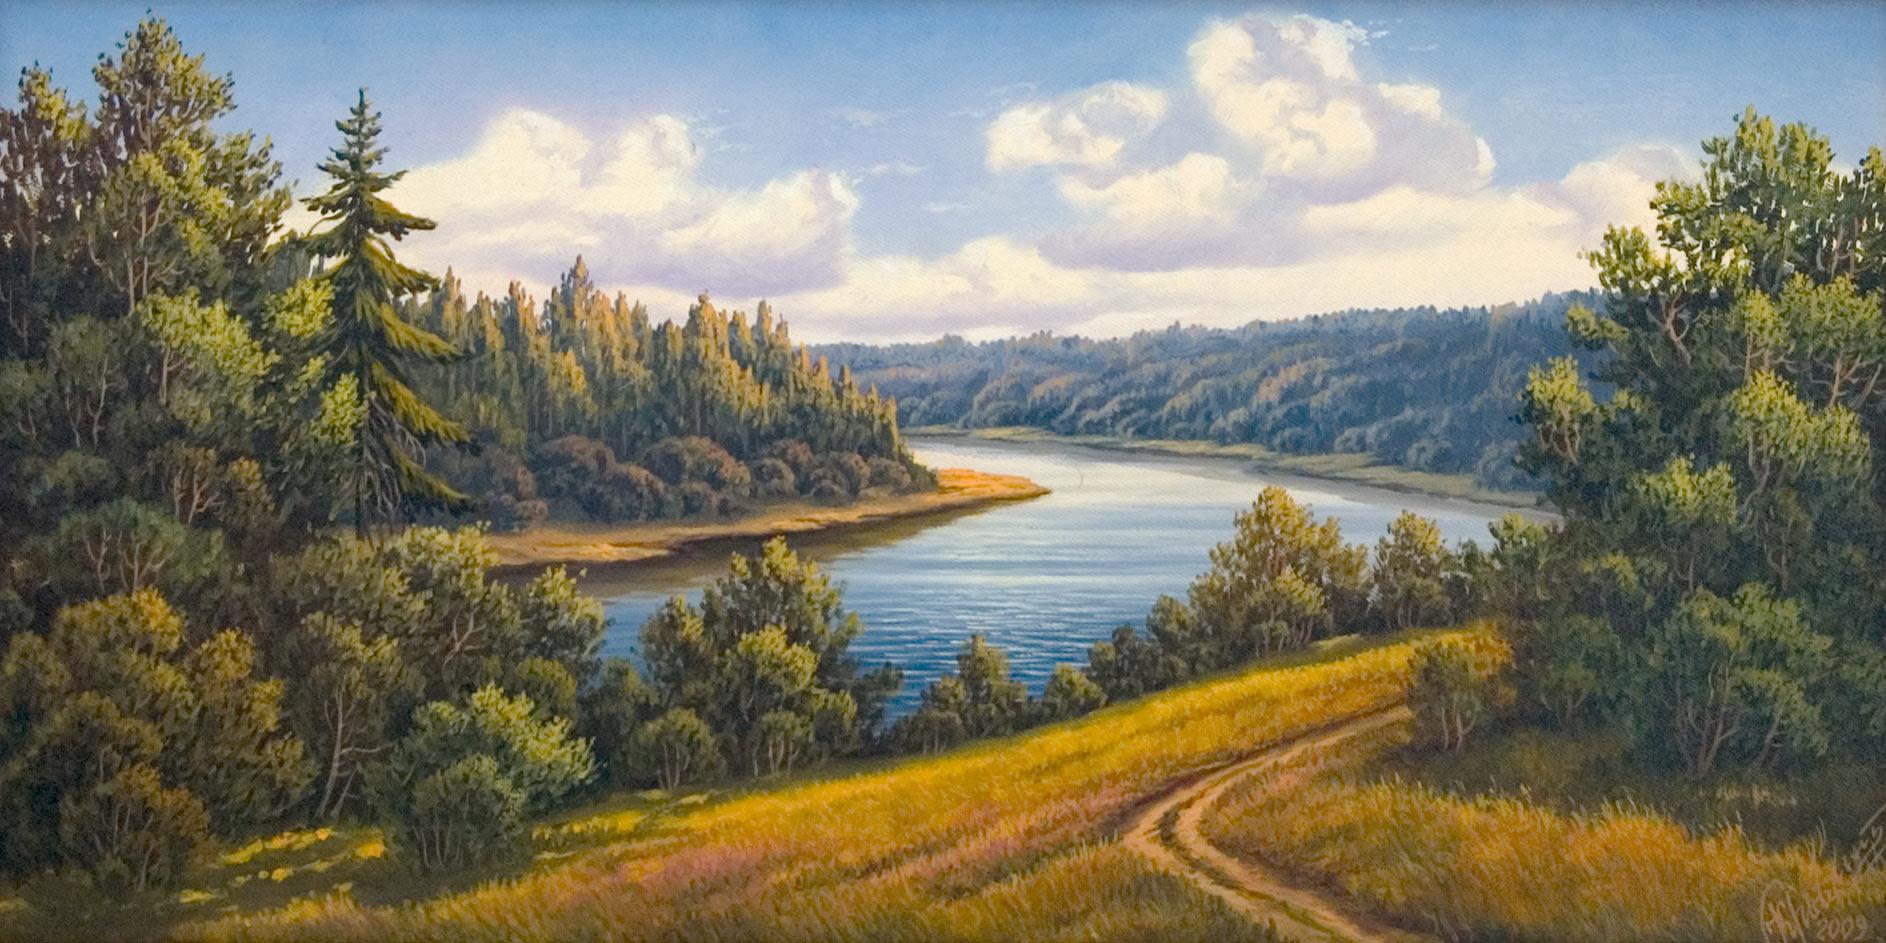 Цена : 14 000,00 руб Купить картину Картина ...: www.gallery-tver.ru/paintings/landscape-15.html